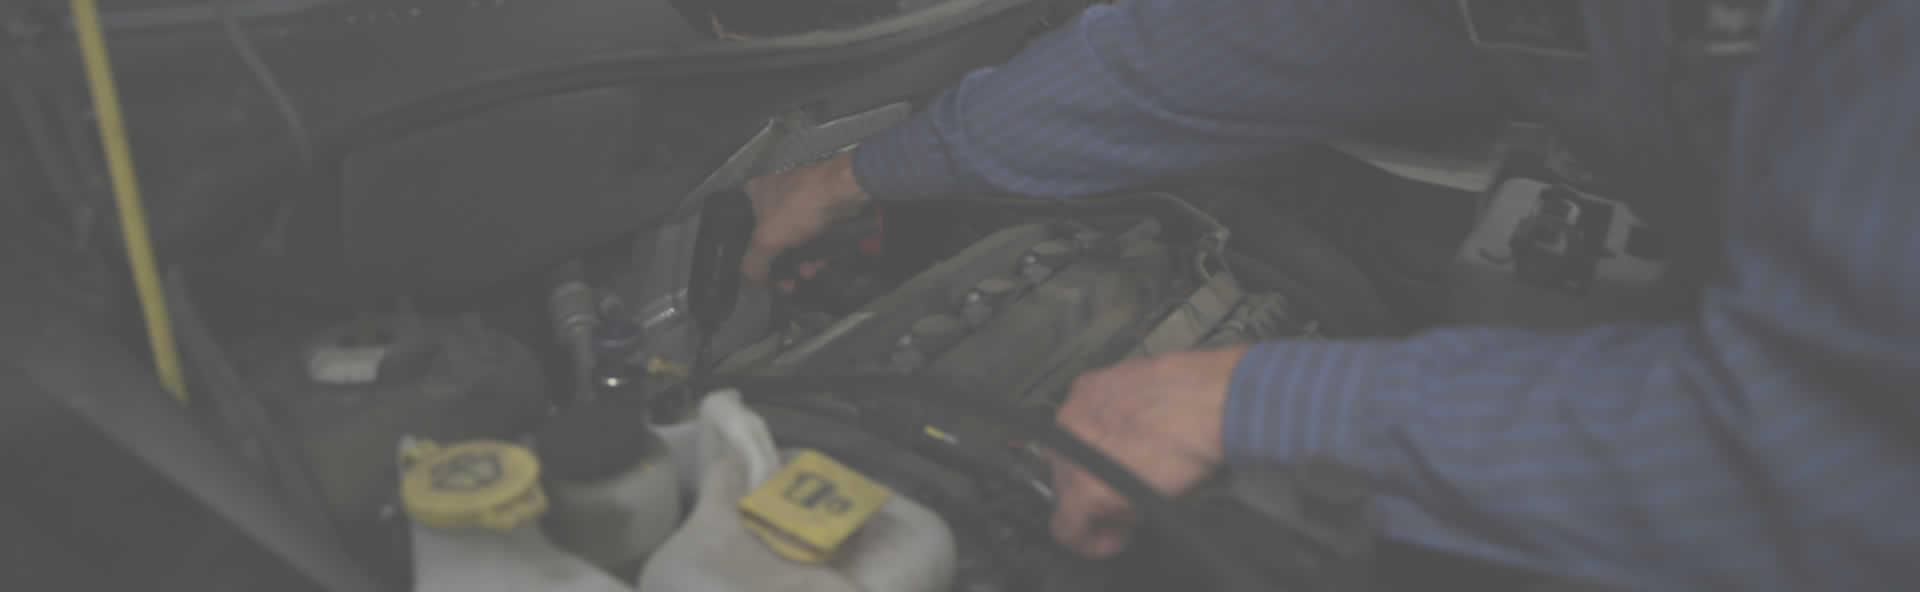 NAPA Certified Mechanics